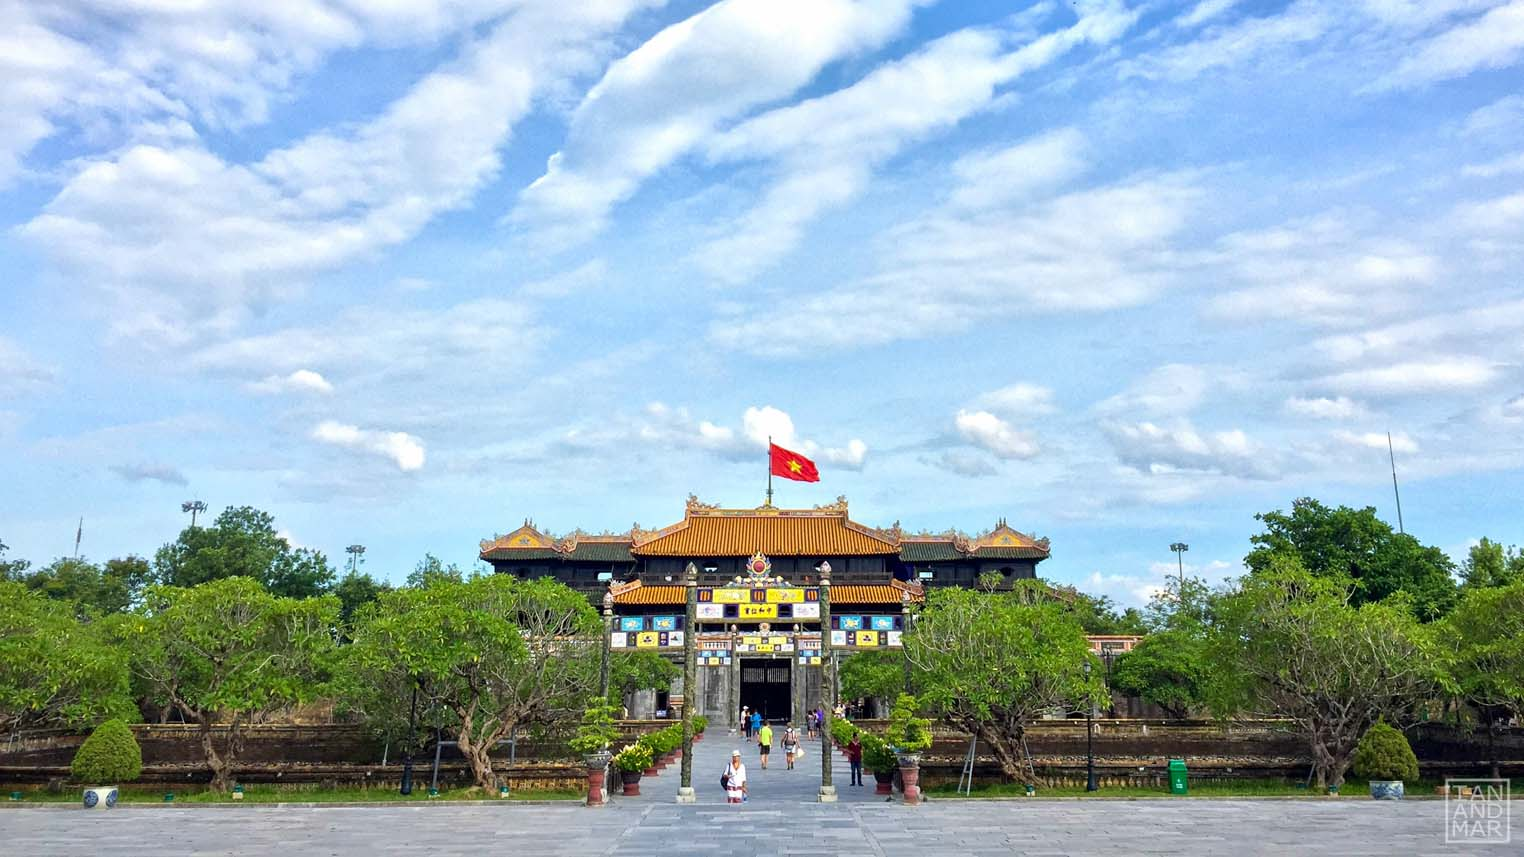 ancient architecture in vietnam